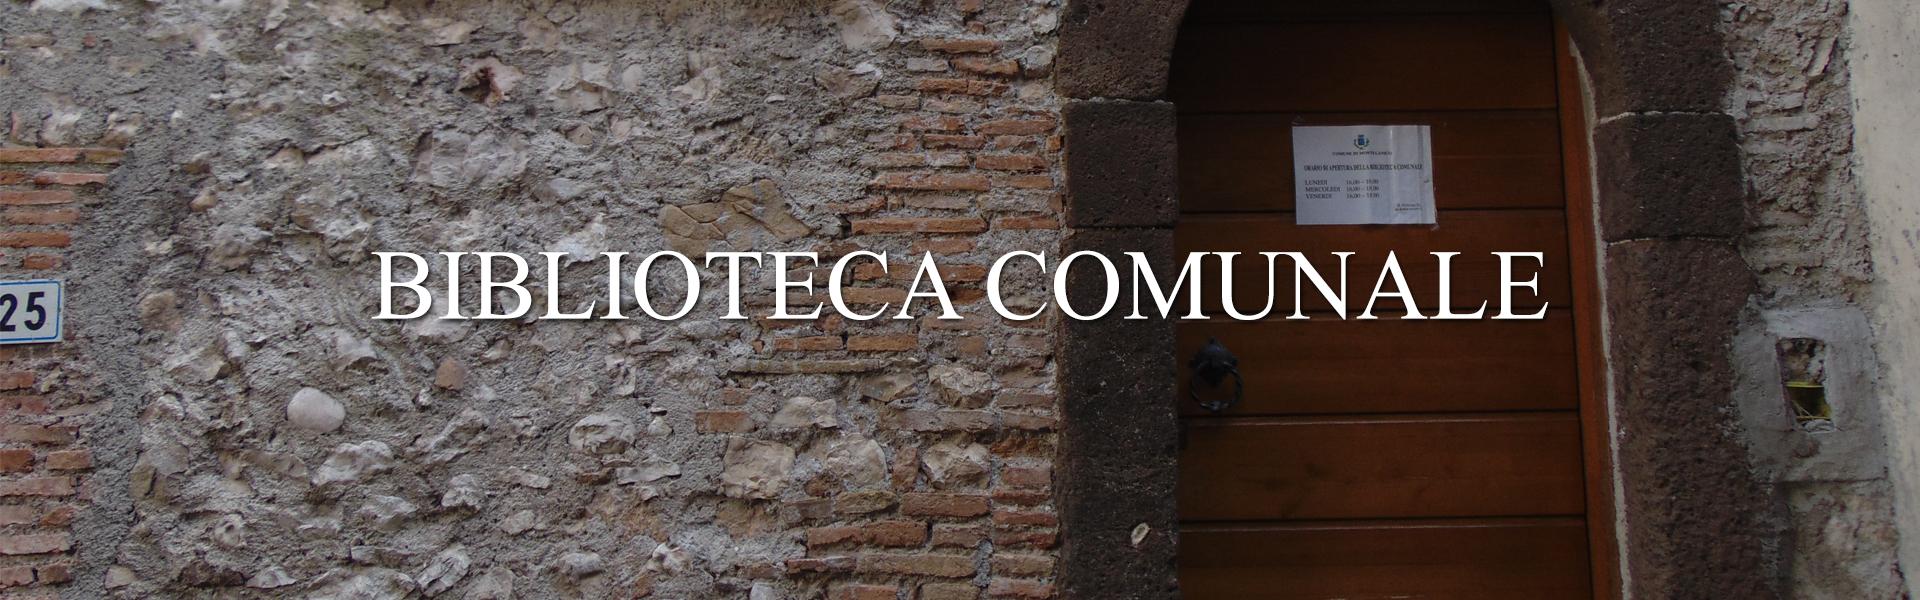 montelanico-cultura-bibliotecacomunale-1920x600